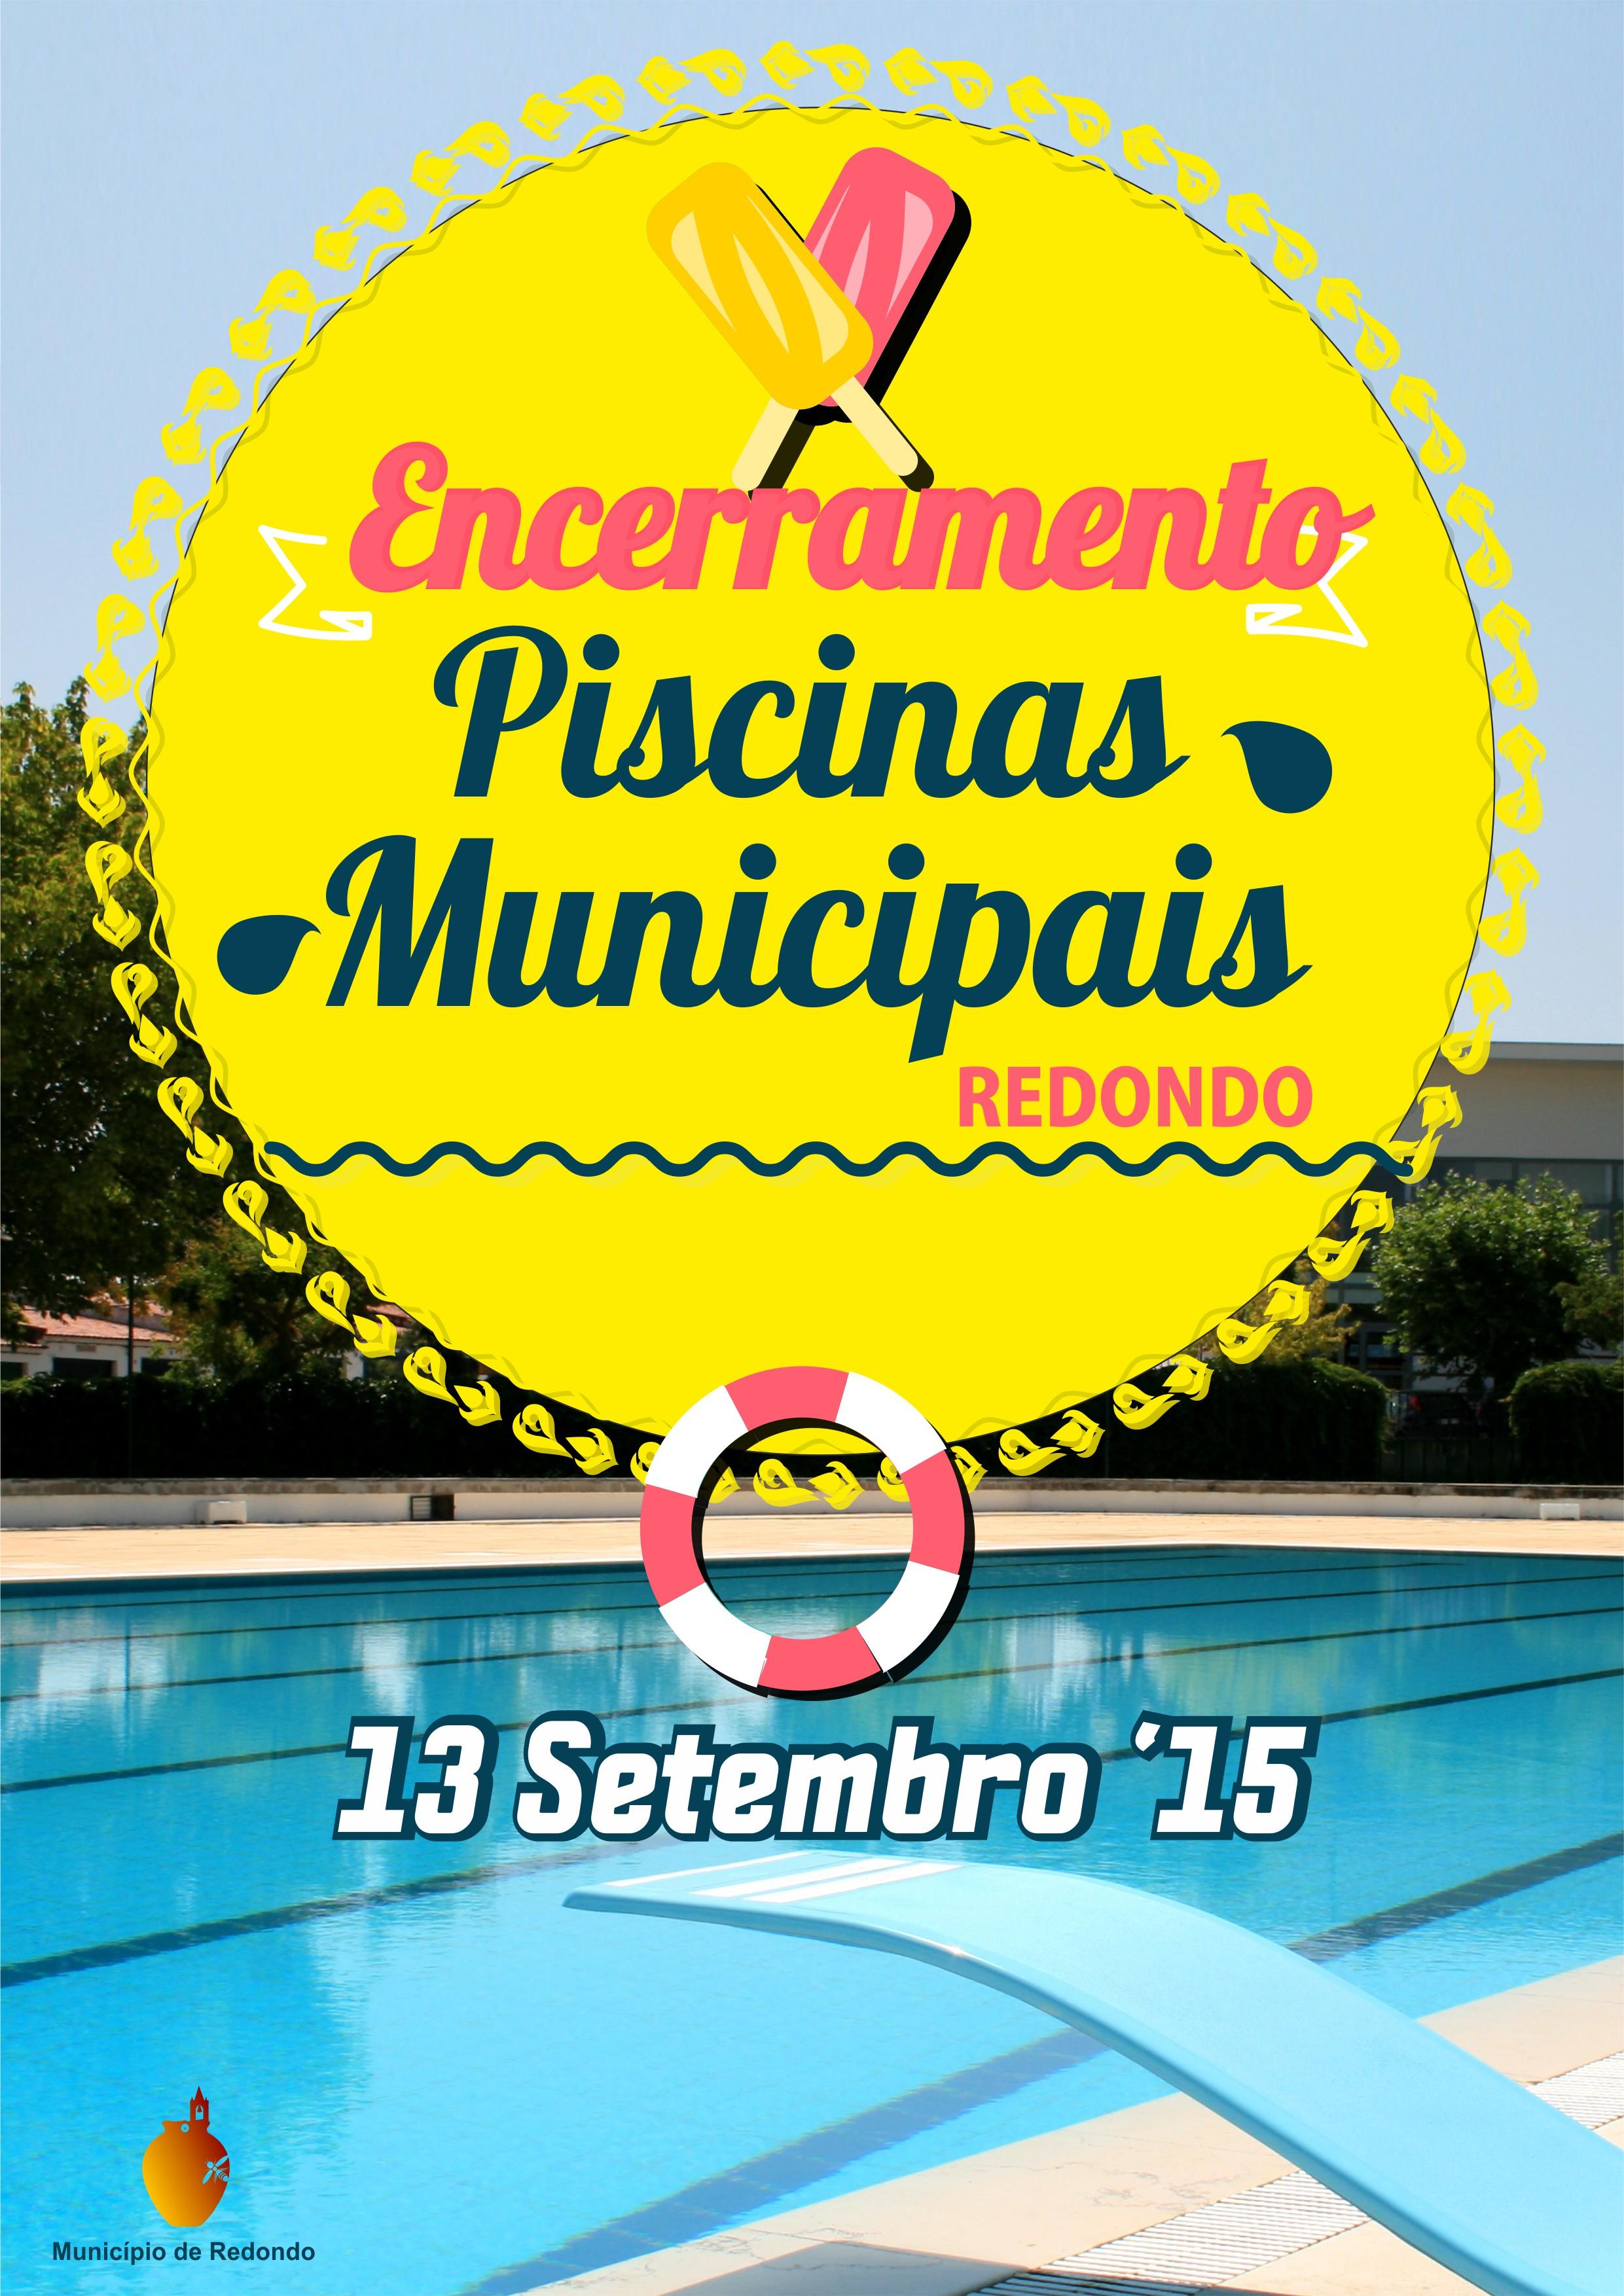 Encerramento Piscinas 2015 (2).jpg